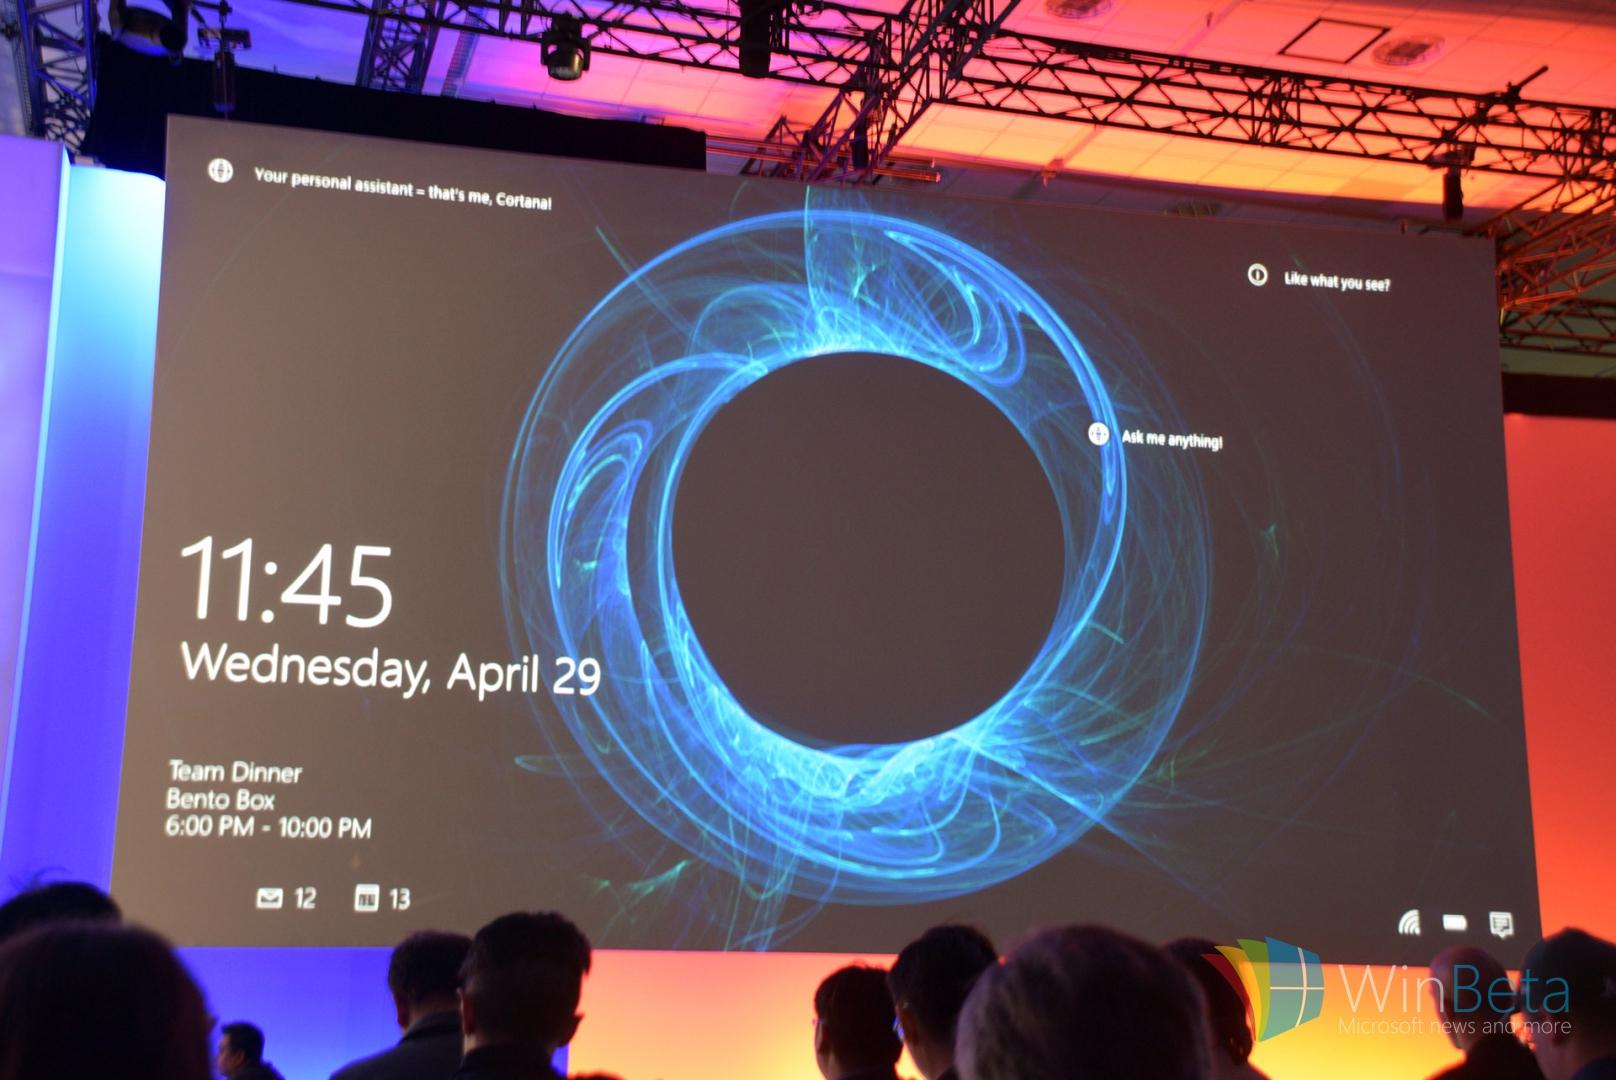 Windows Spotlight a new lockscreen experience for Windows 10 1616x1080